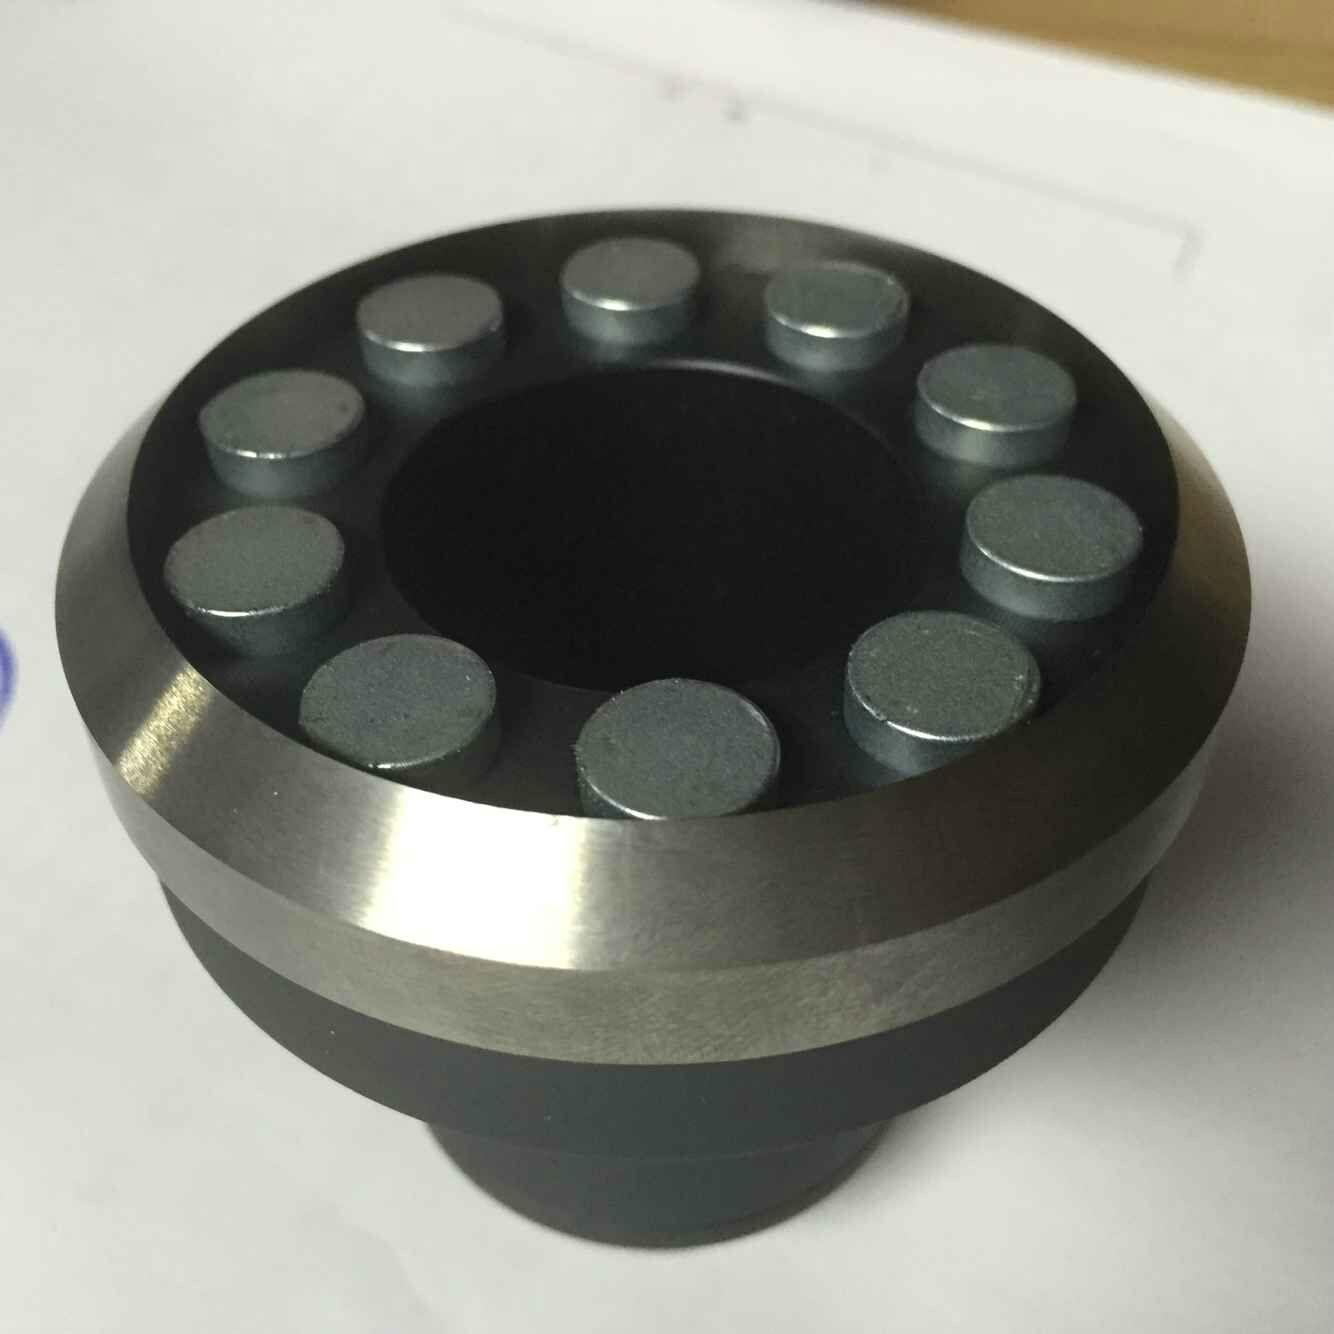 outside diameter 70mm, innder diameter 60mm, ink cup ring high 12mm sealed ink cup for pad printer